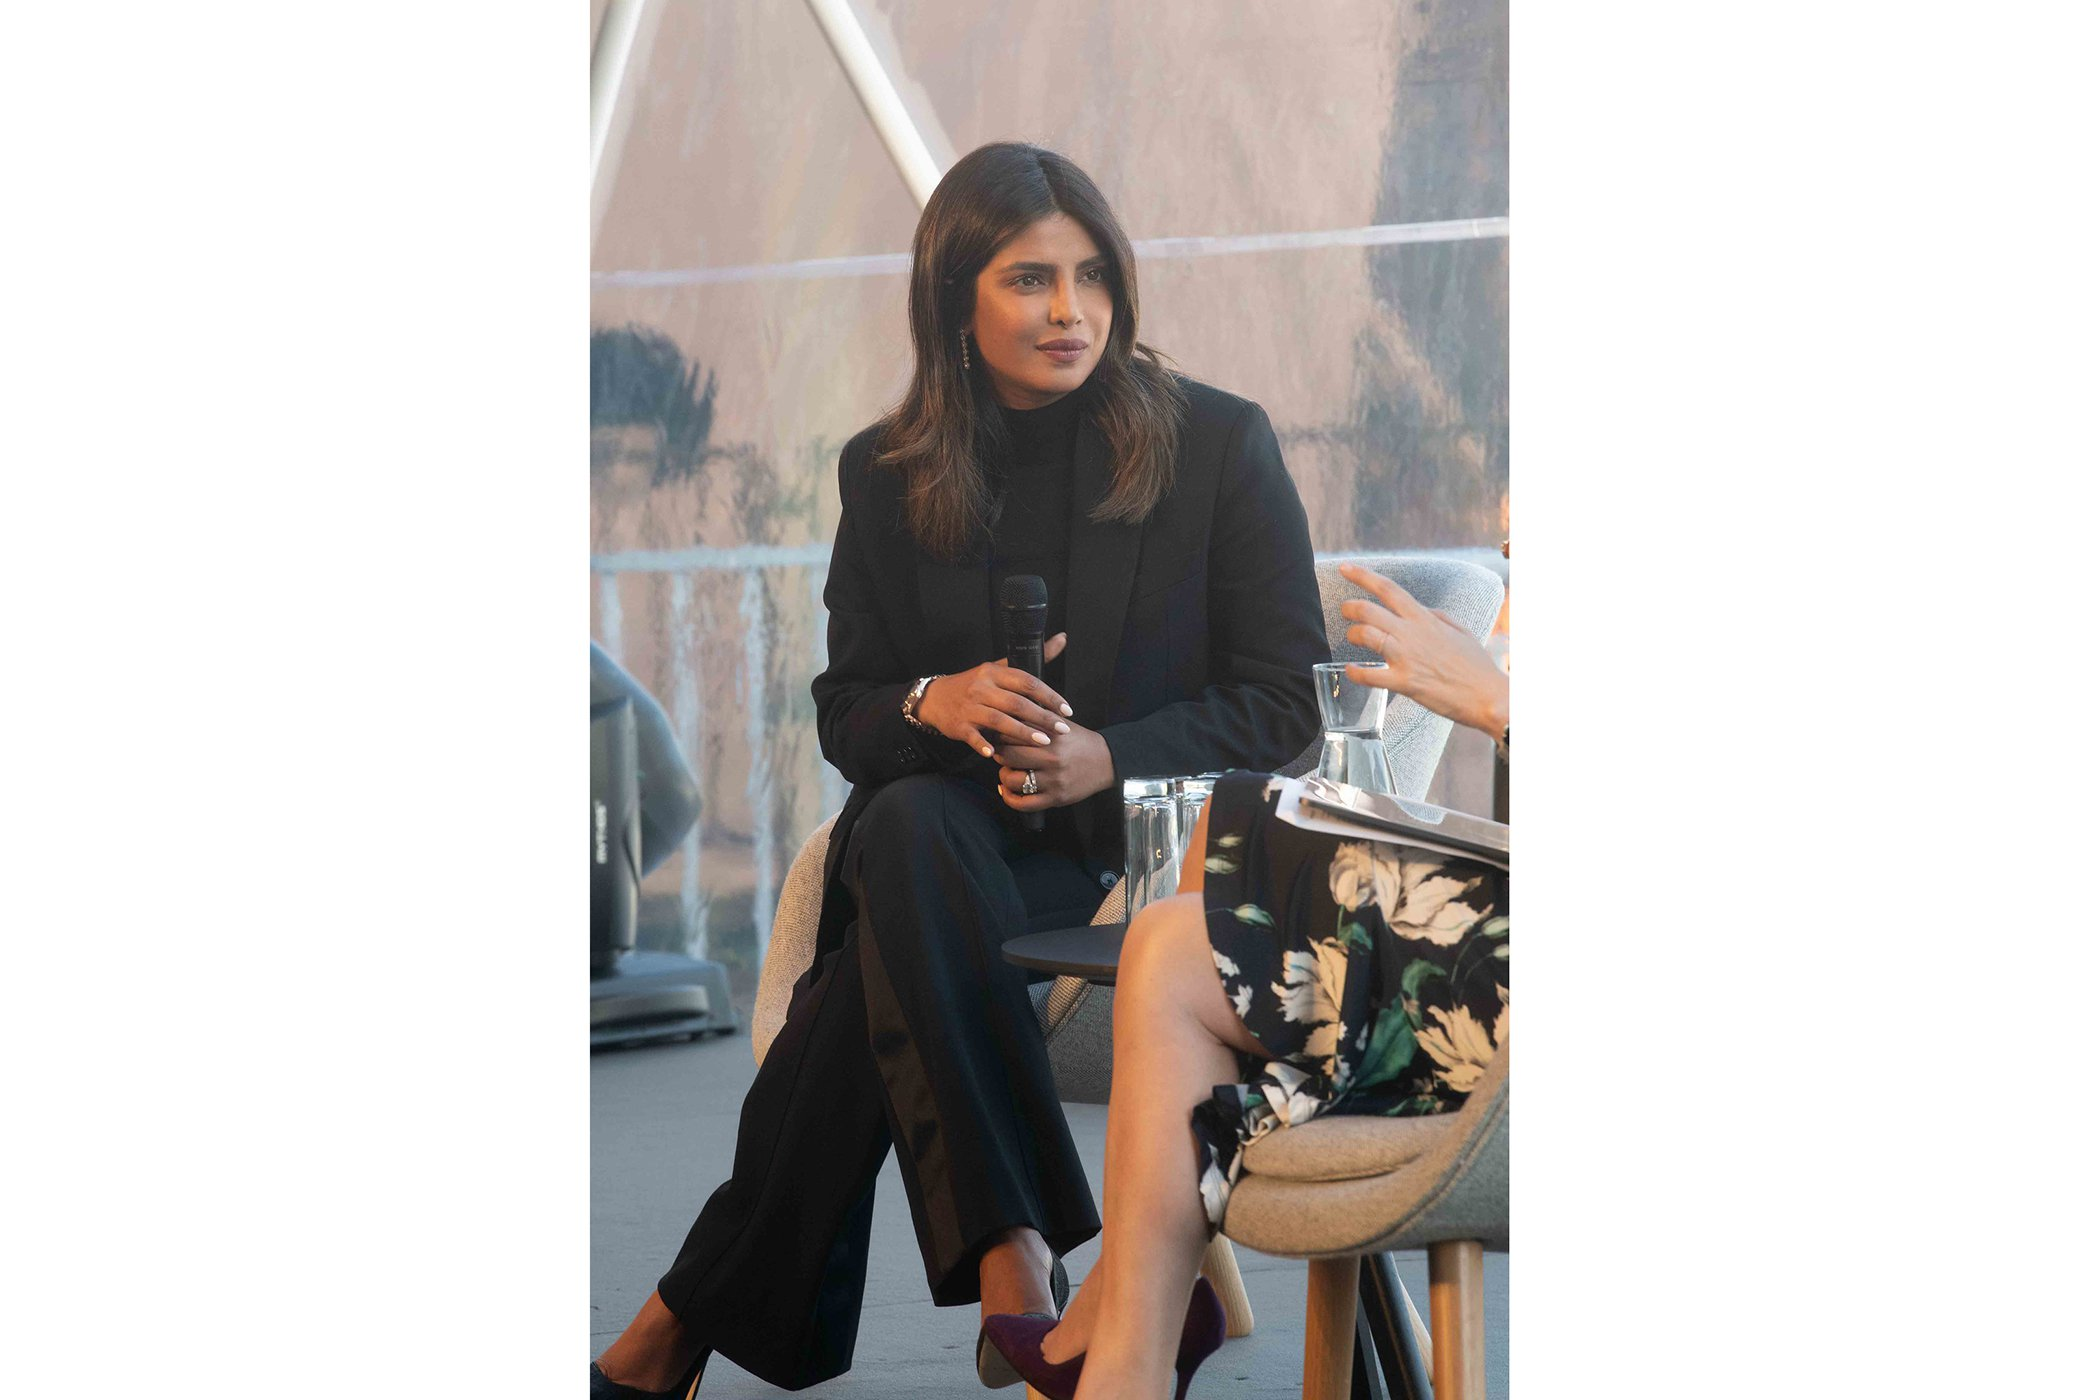 Priyanka-Chopra-Jonas-Davos-GlobalCitizen-2020-Full.jpg